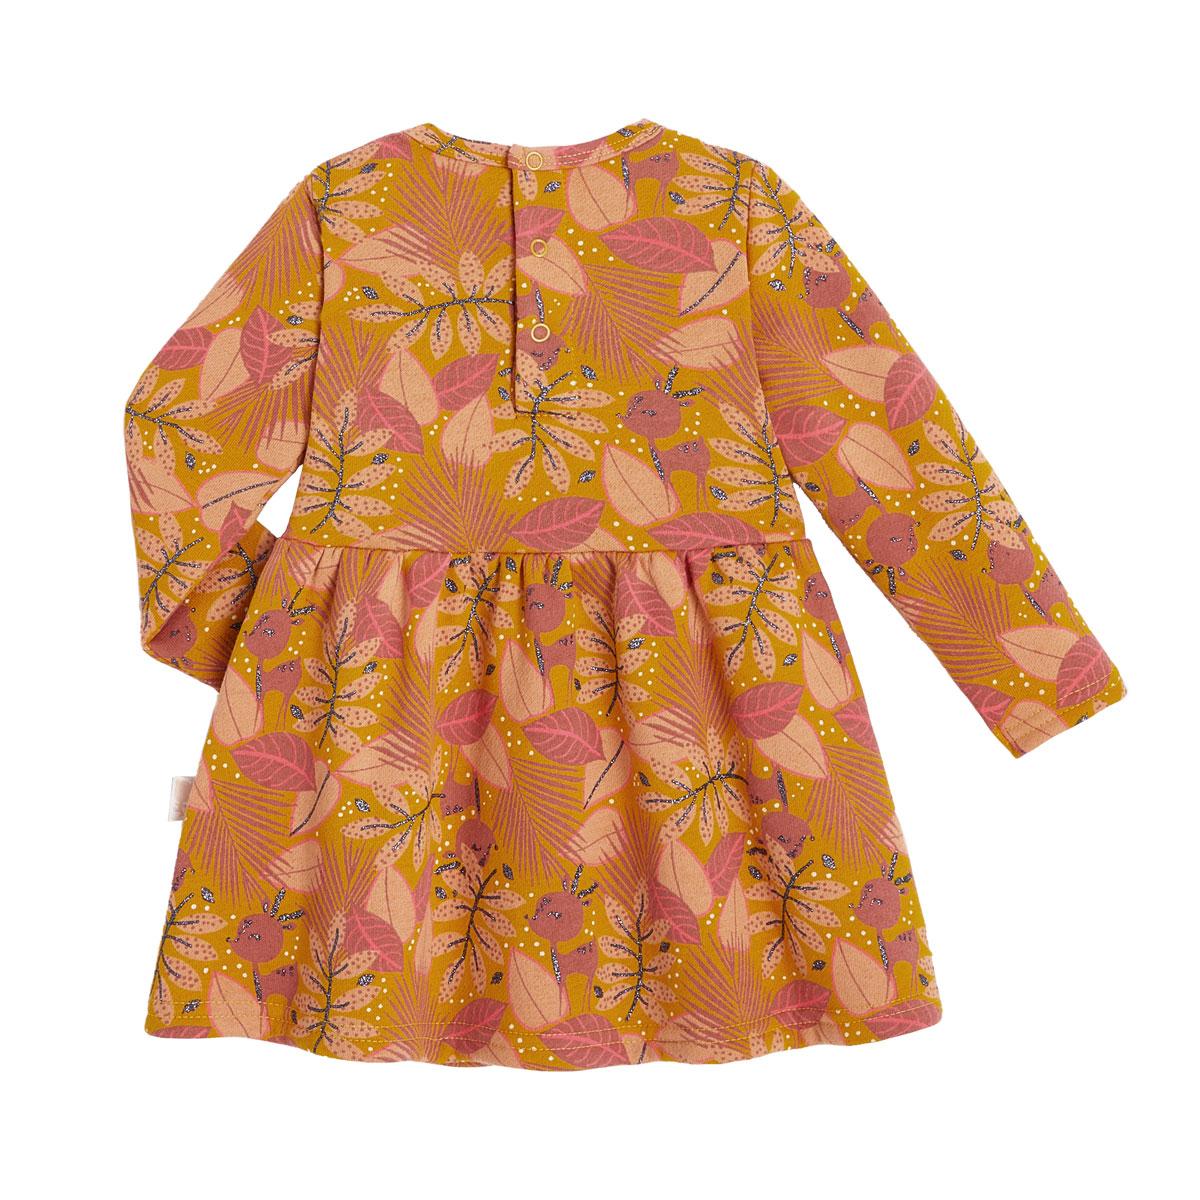 Robe fille en molleton, legging et bandeau contenant du coton bio Papaye dos